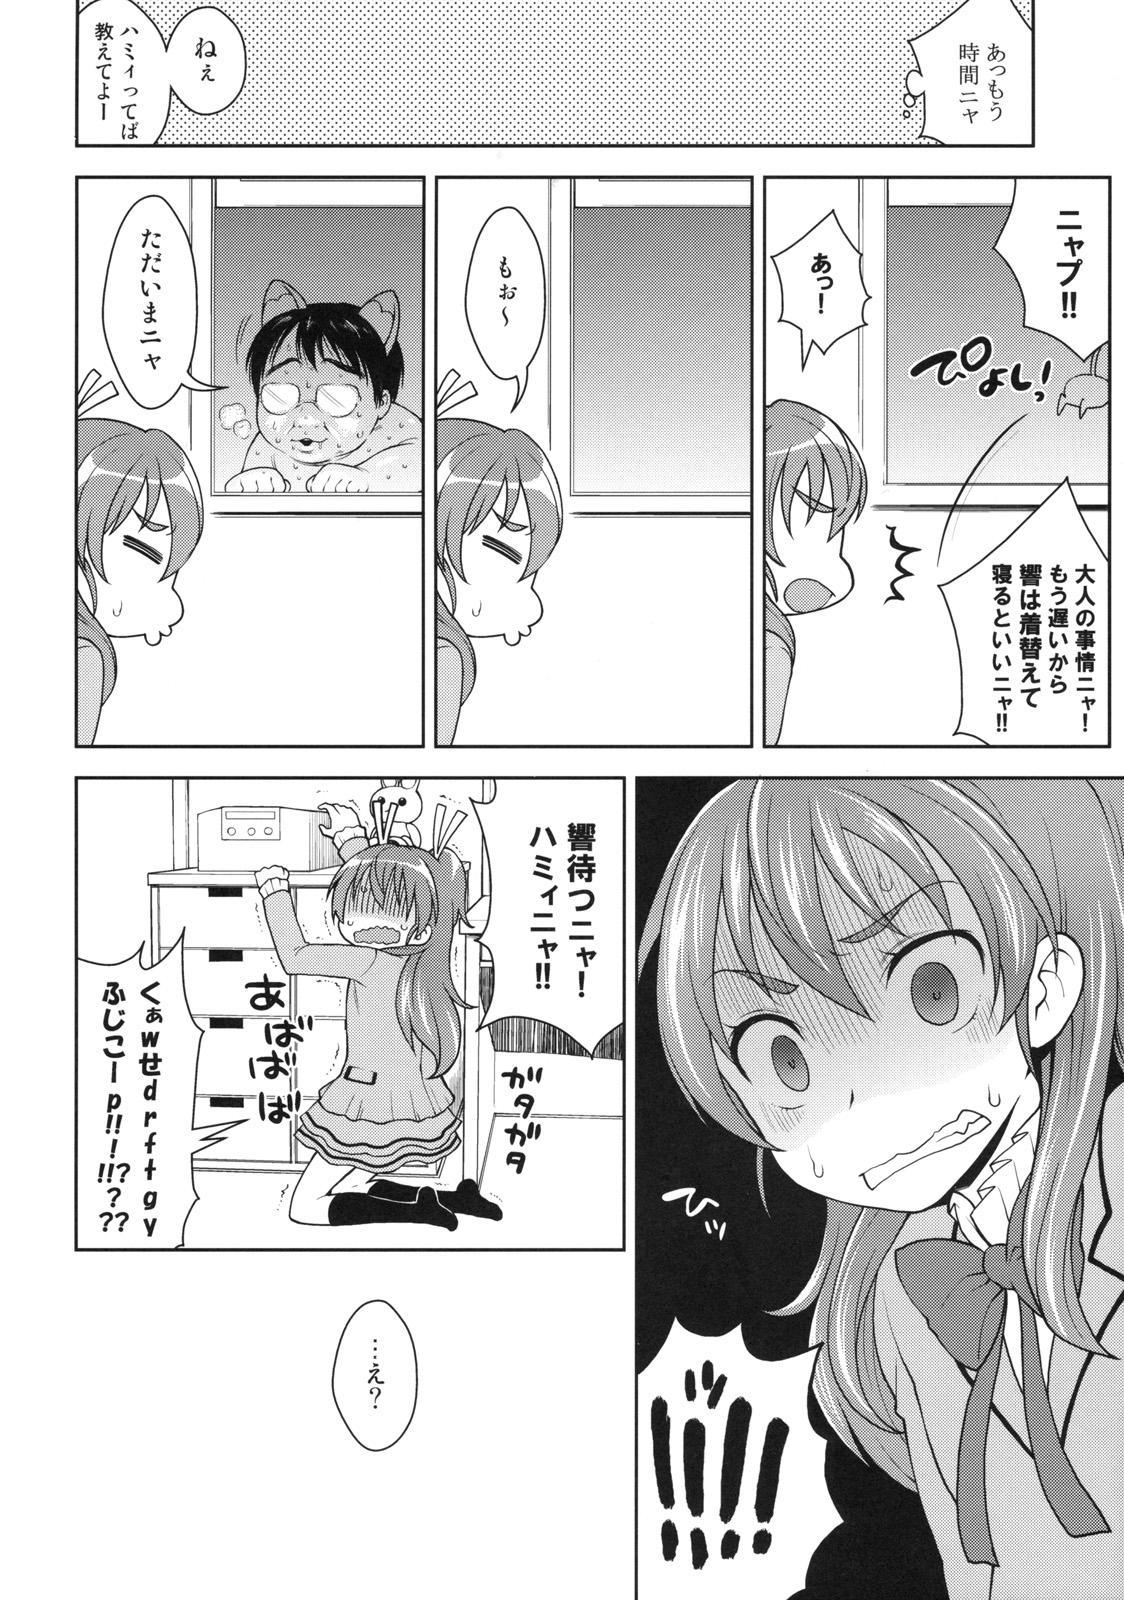 Hibiki to Let's Play♪ 2